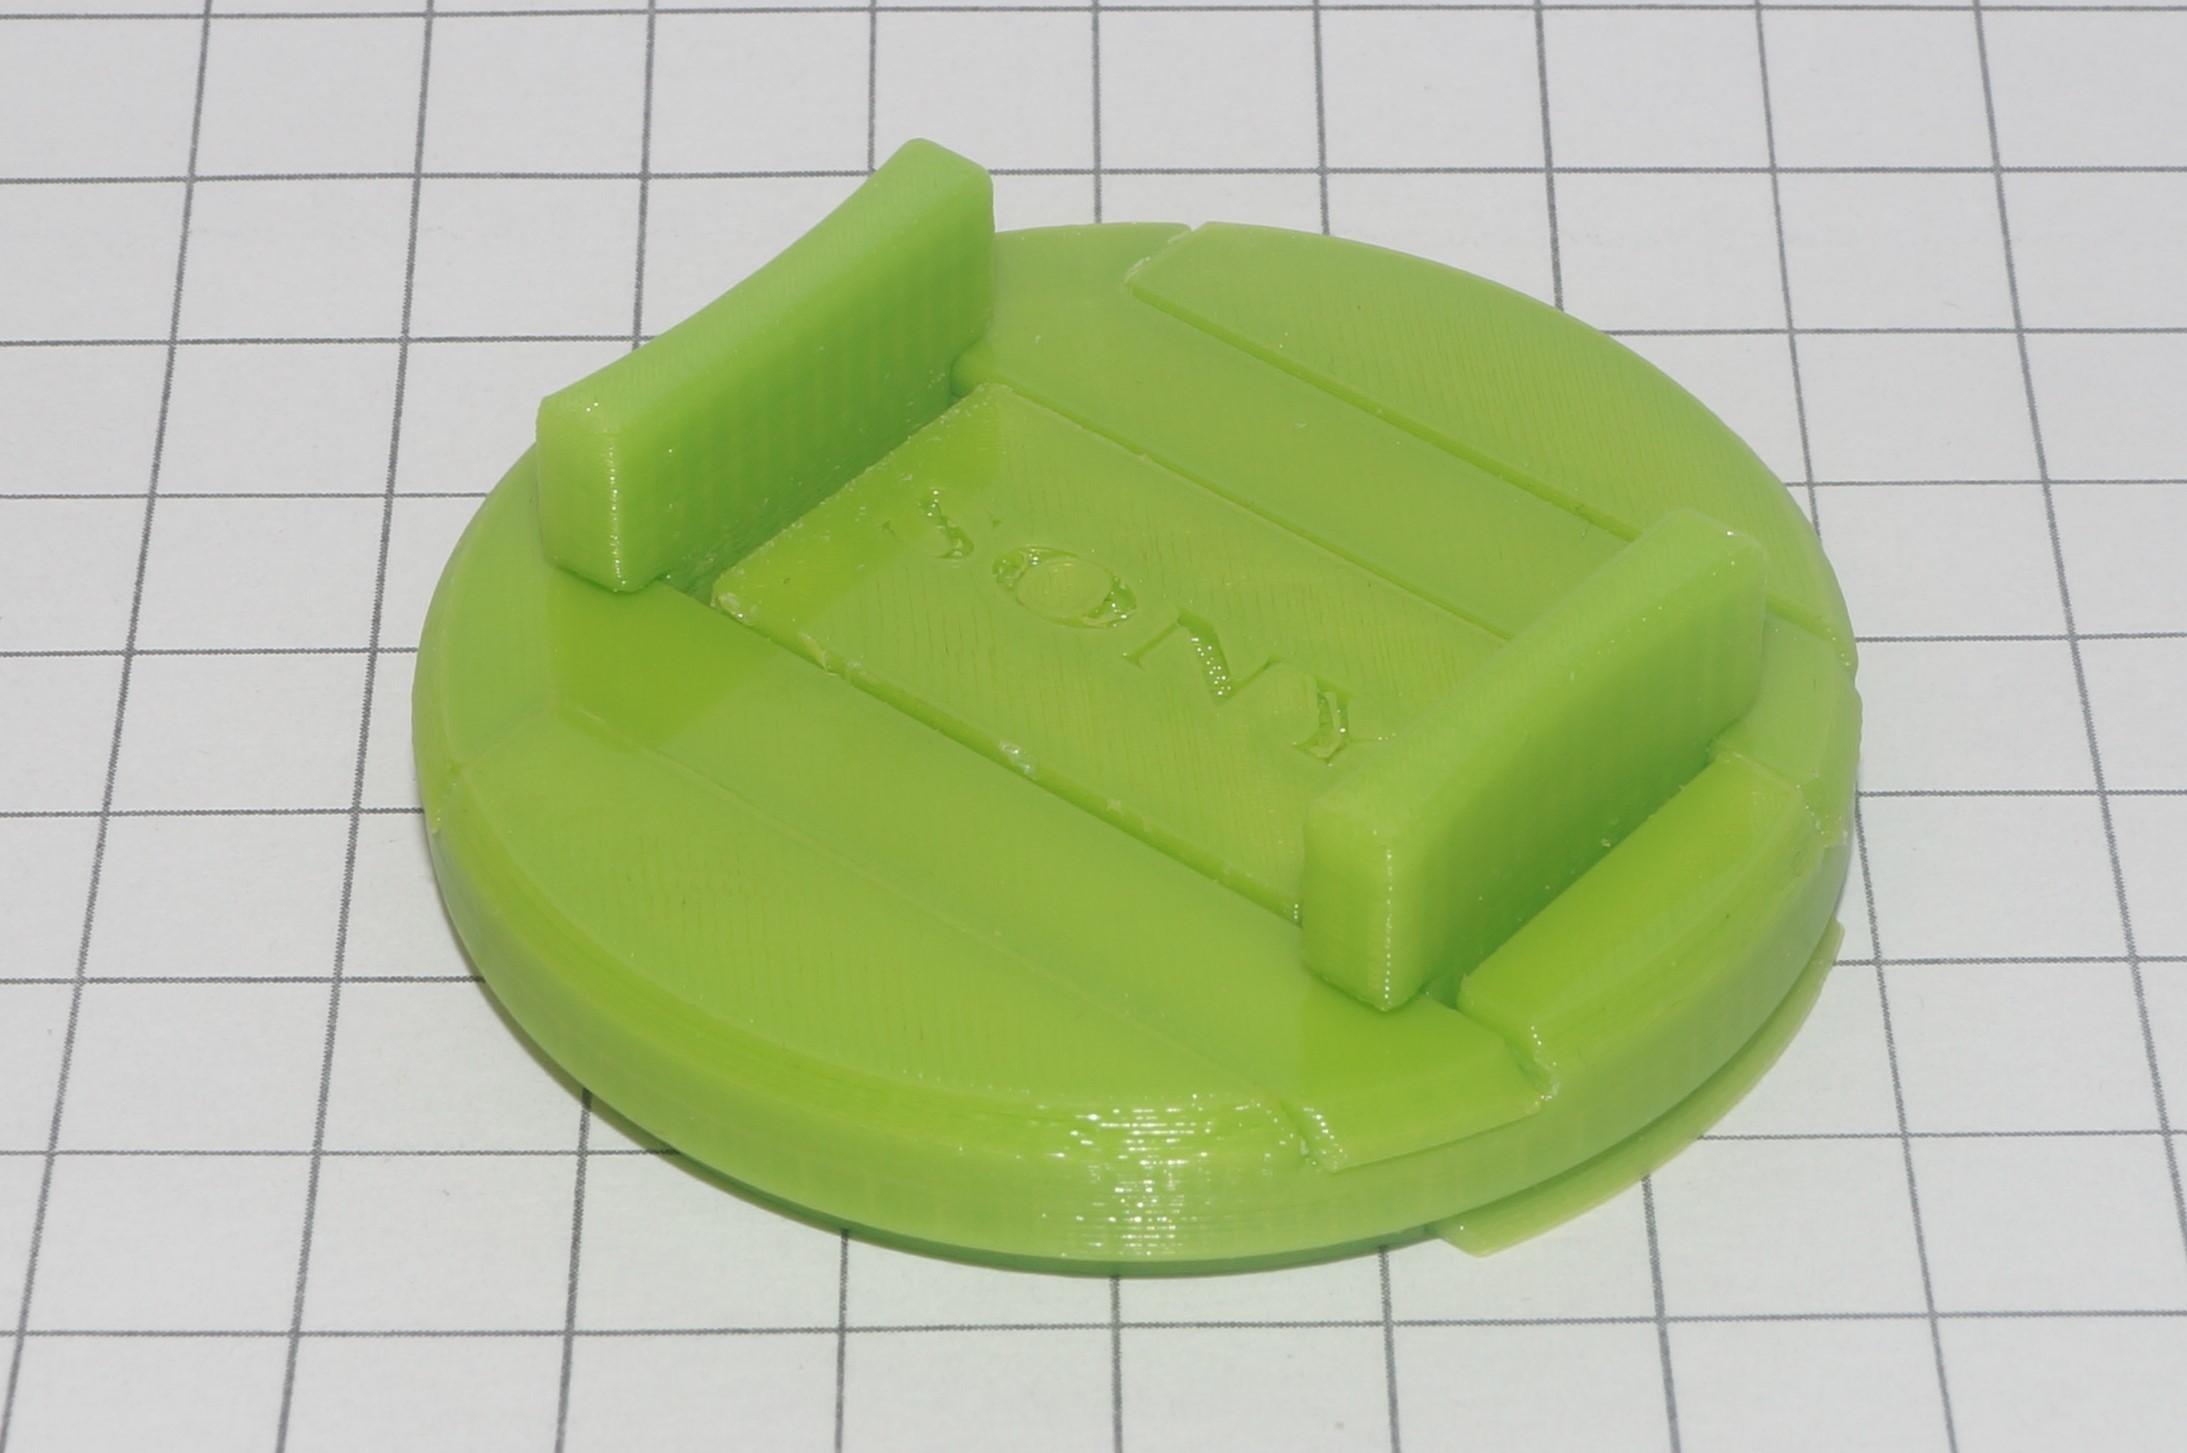 DSC06556.JPG Download free STL file Крышка объектива 55мм фотоаппарата SONY • 3D print design, Vladimir310873